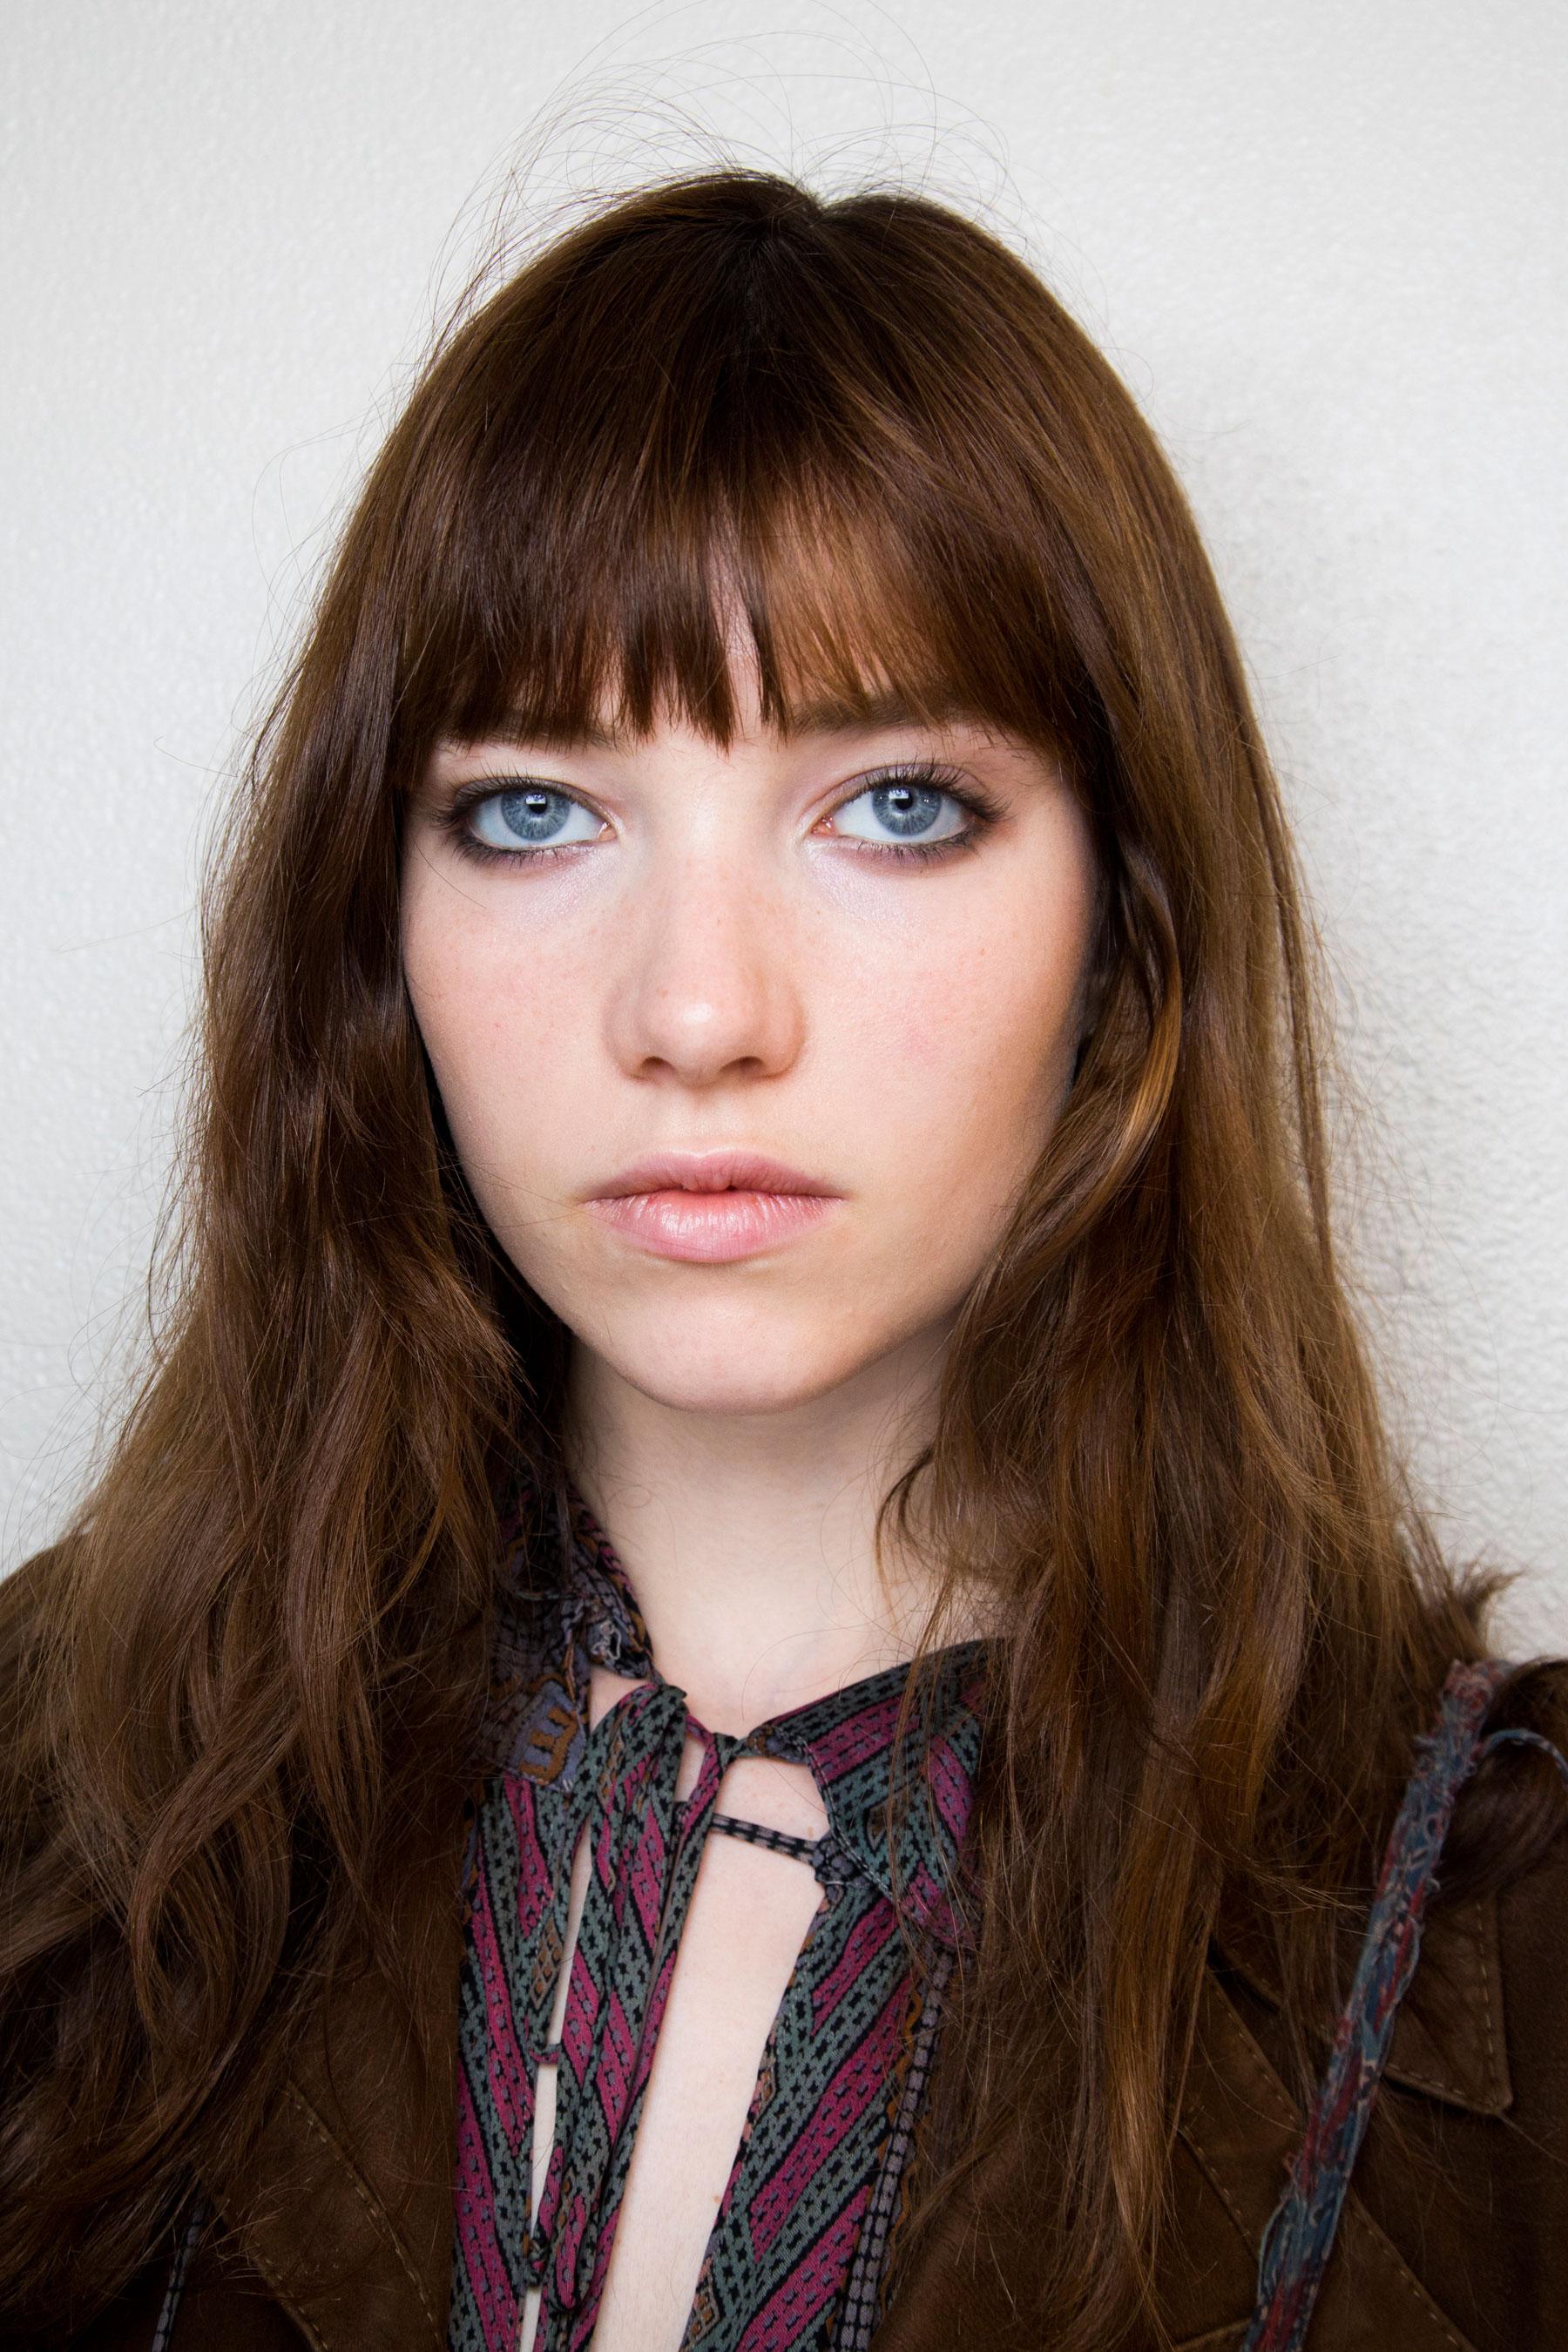 Chloe-spring-2016-beauty-fashion-show-the-impression-102